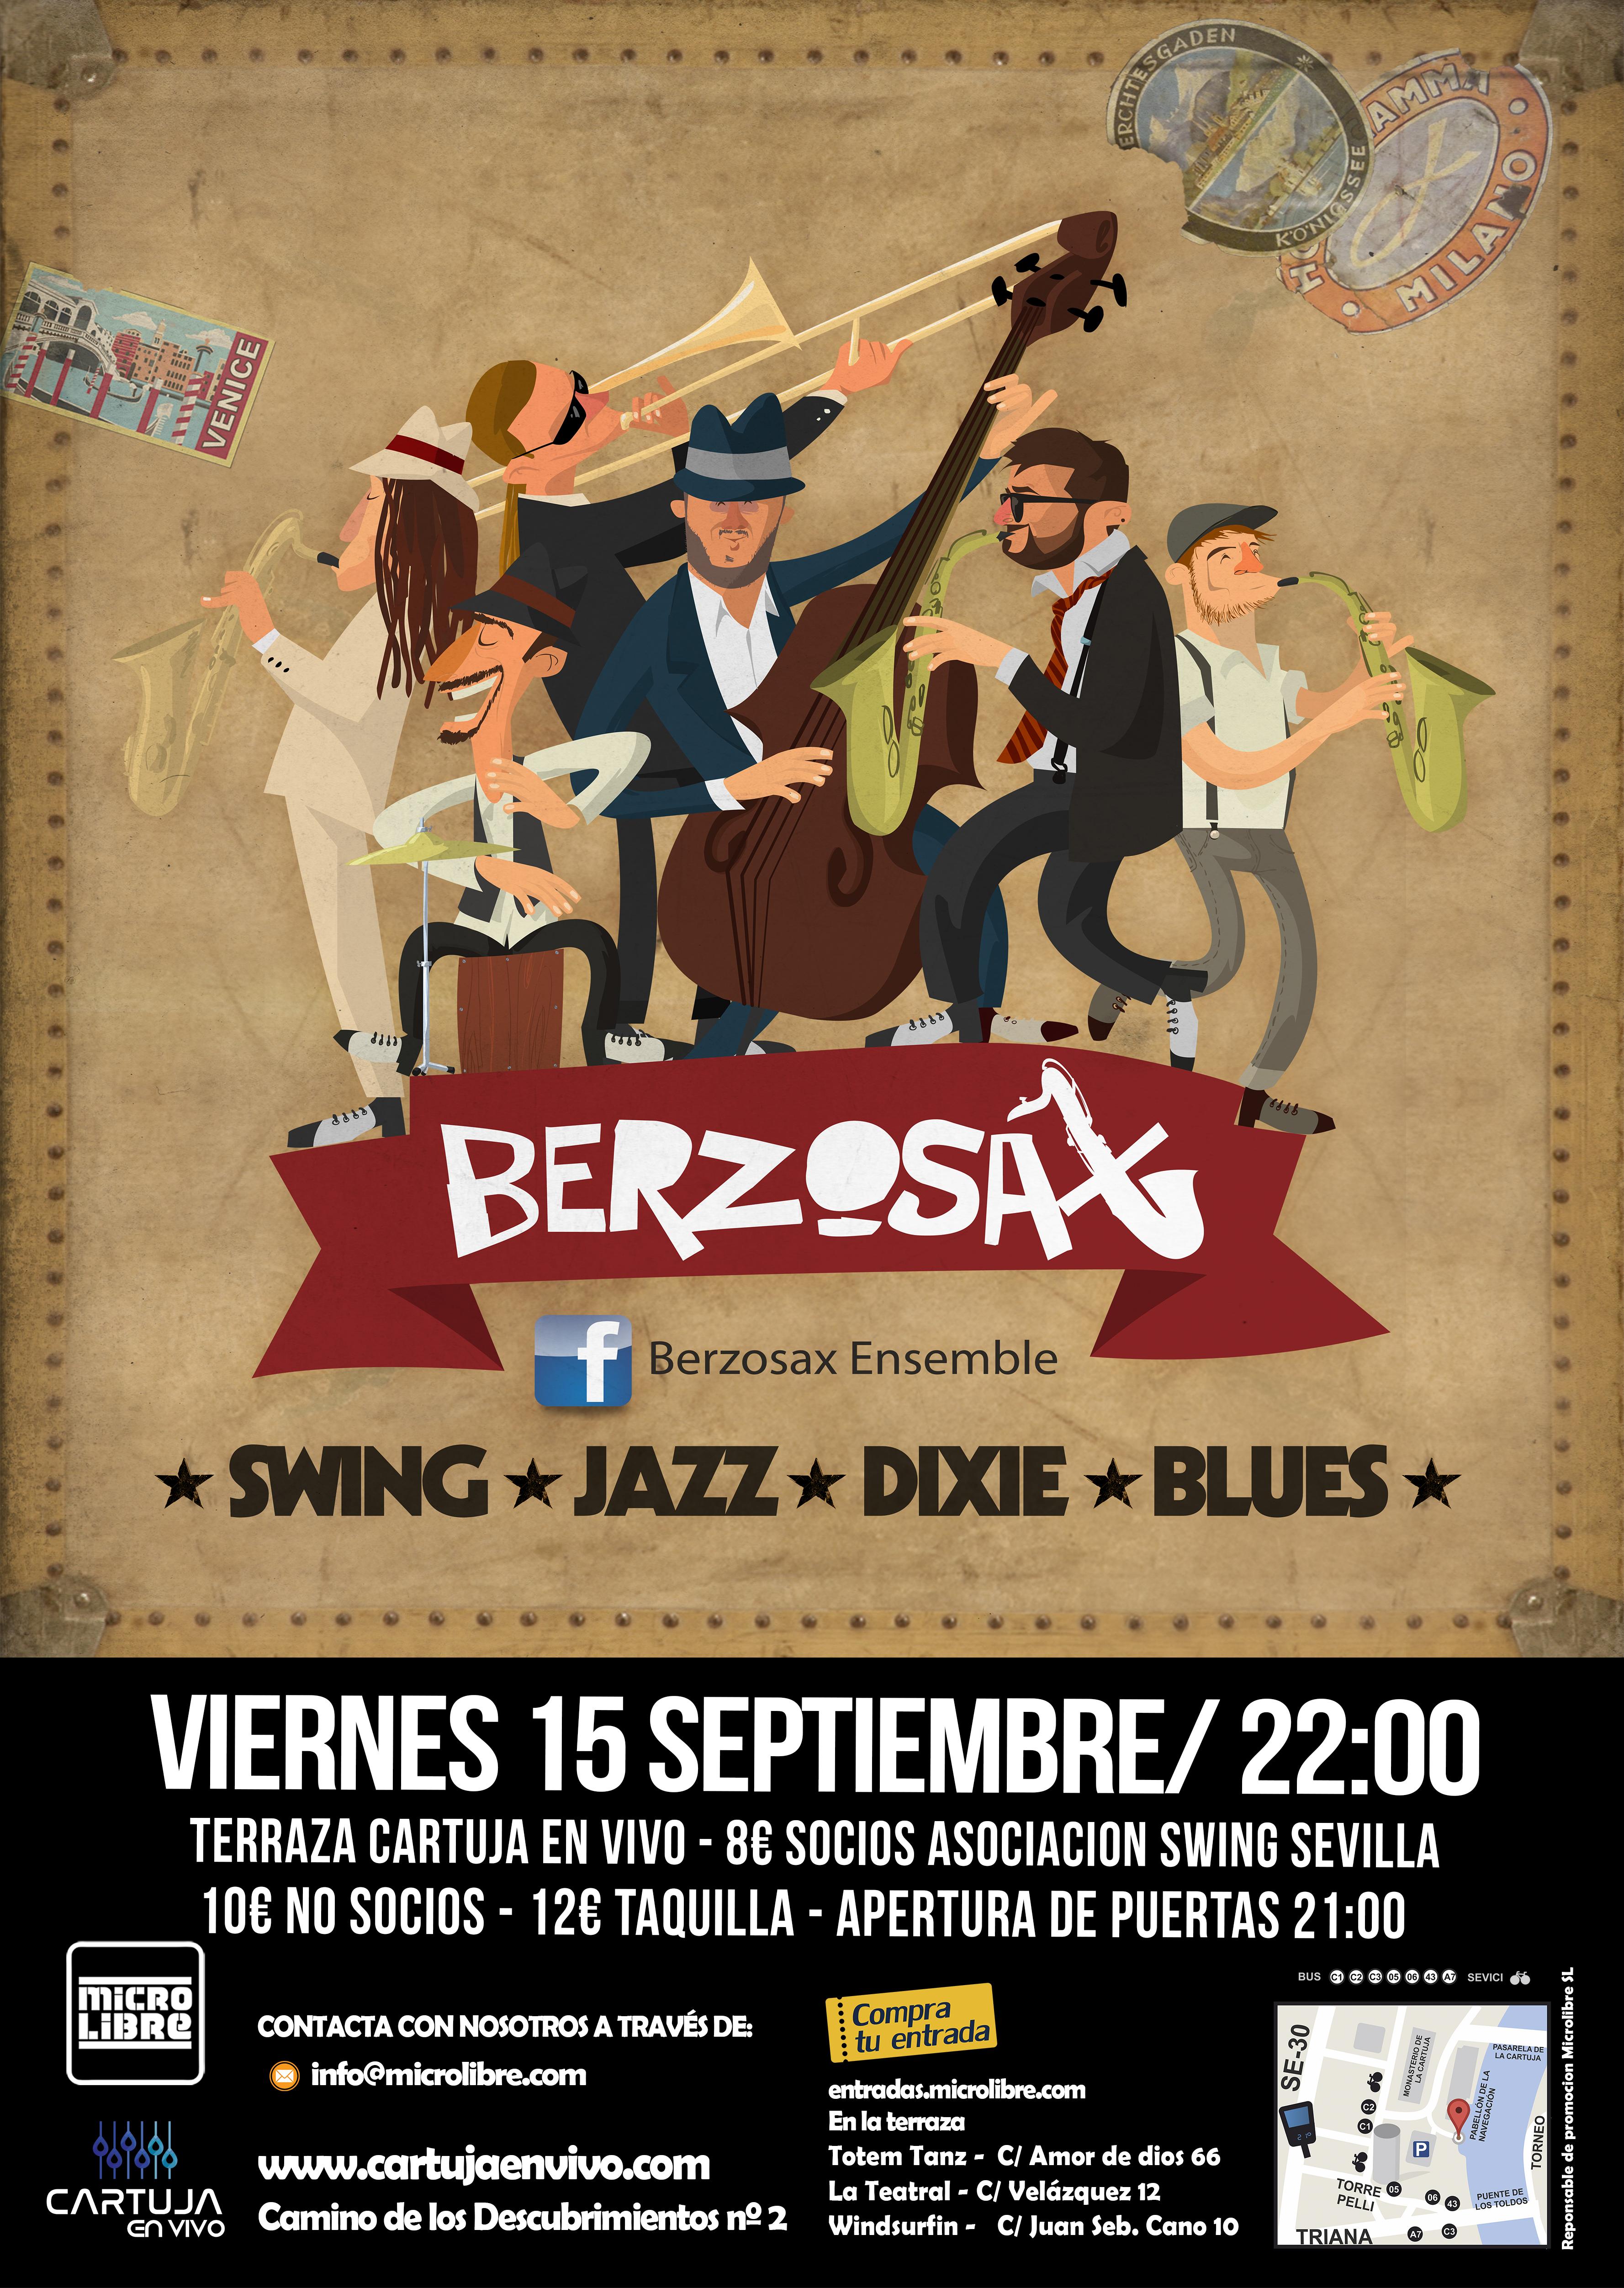 Fiesta Swing Berzosax Ensemble - 15Septiembre - Cartuja en Vivo 538d92c9d61